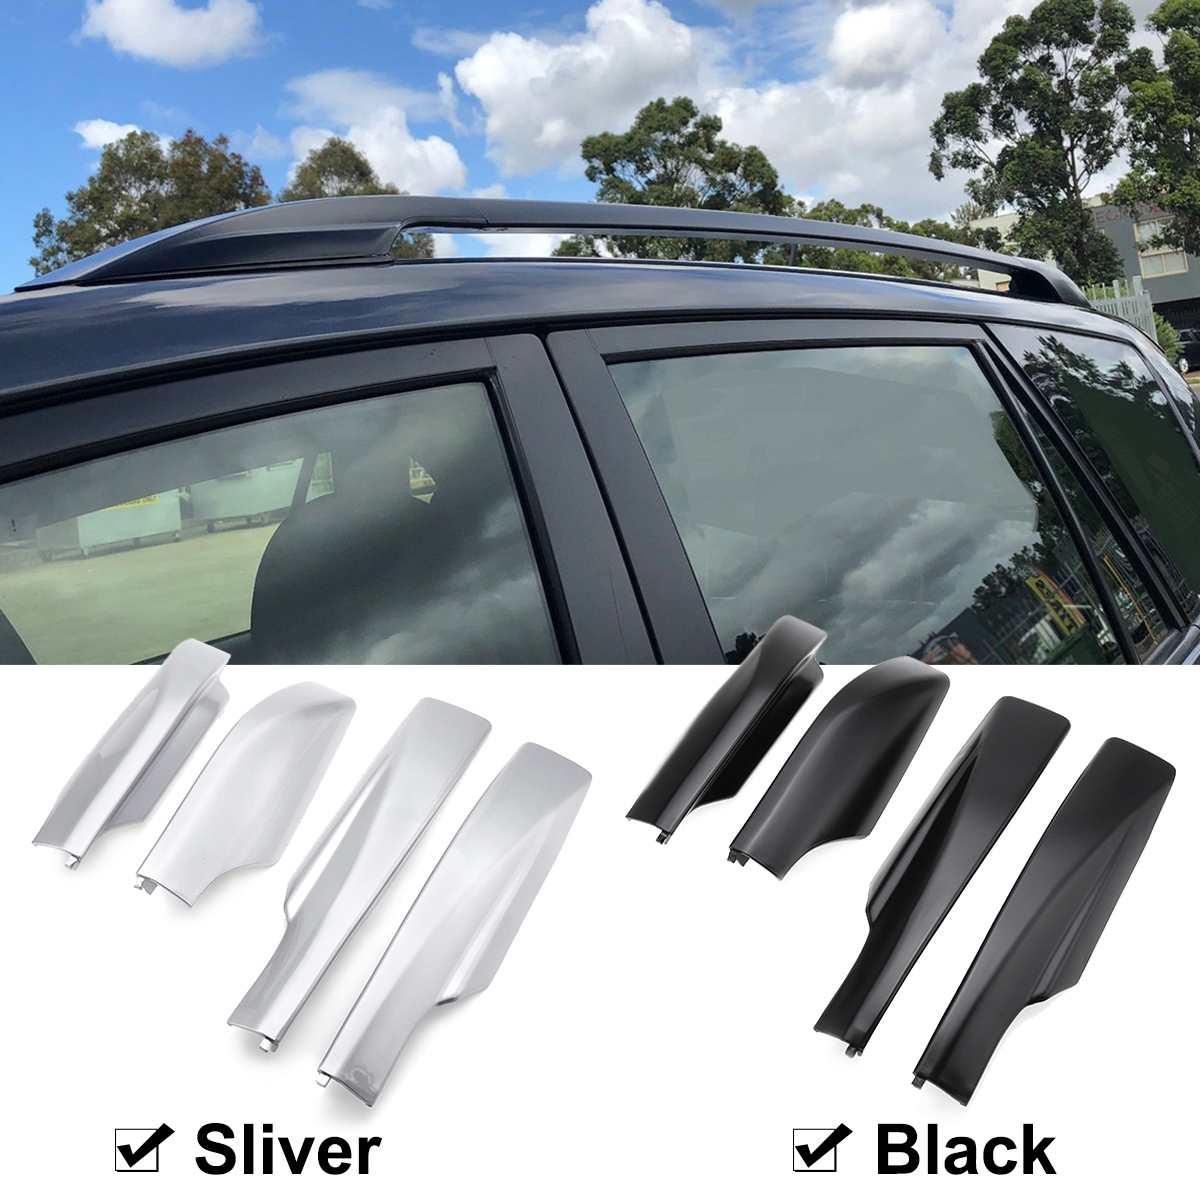 4 Pcs Black Silver ABS หลังคา Rack Rail End ป้องกัน Cover Shell สำหรับ TOYOTA RAV4 2007 2008 2009 2010 2011 2012